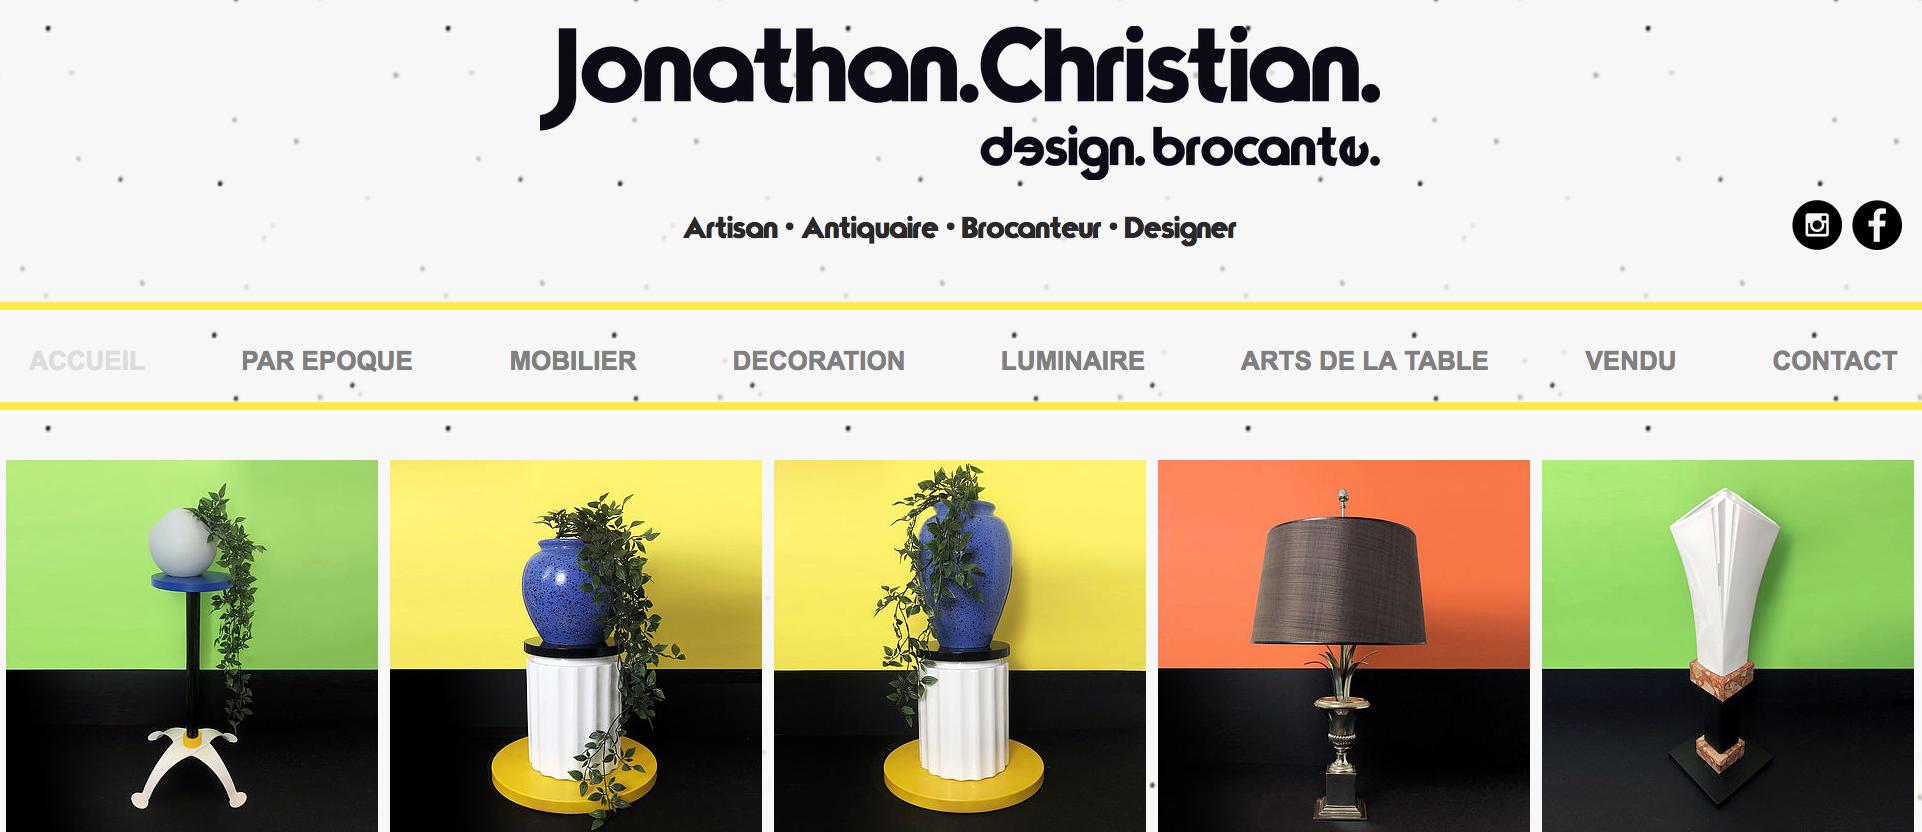 Jonathan Christian - Site vitrine